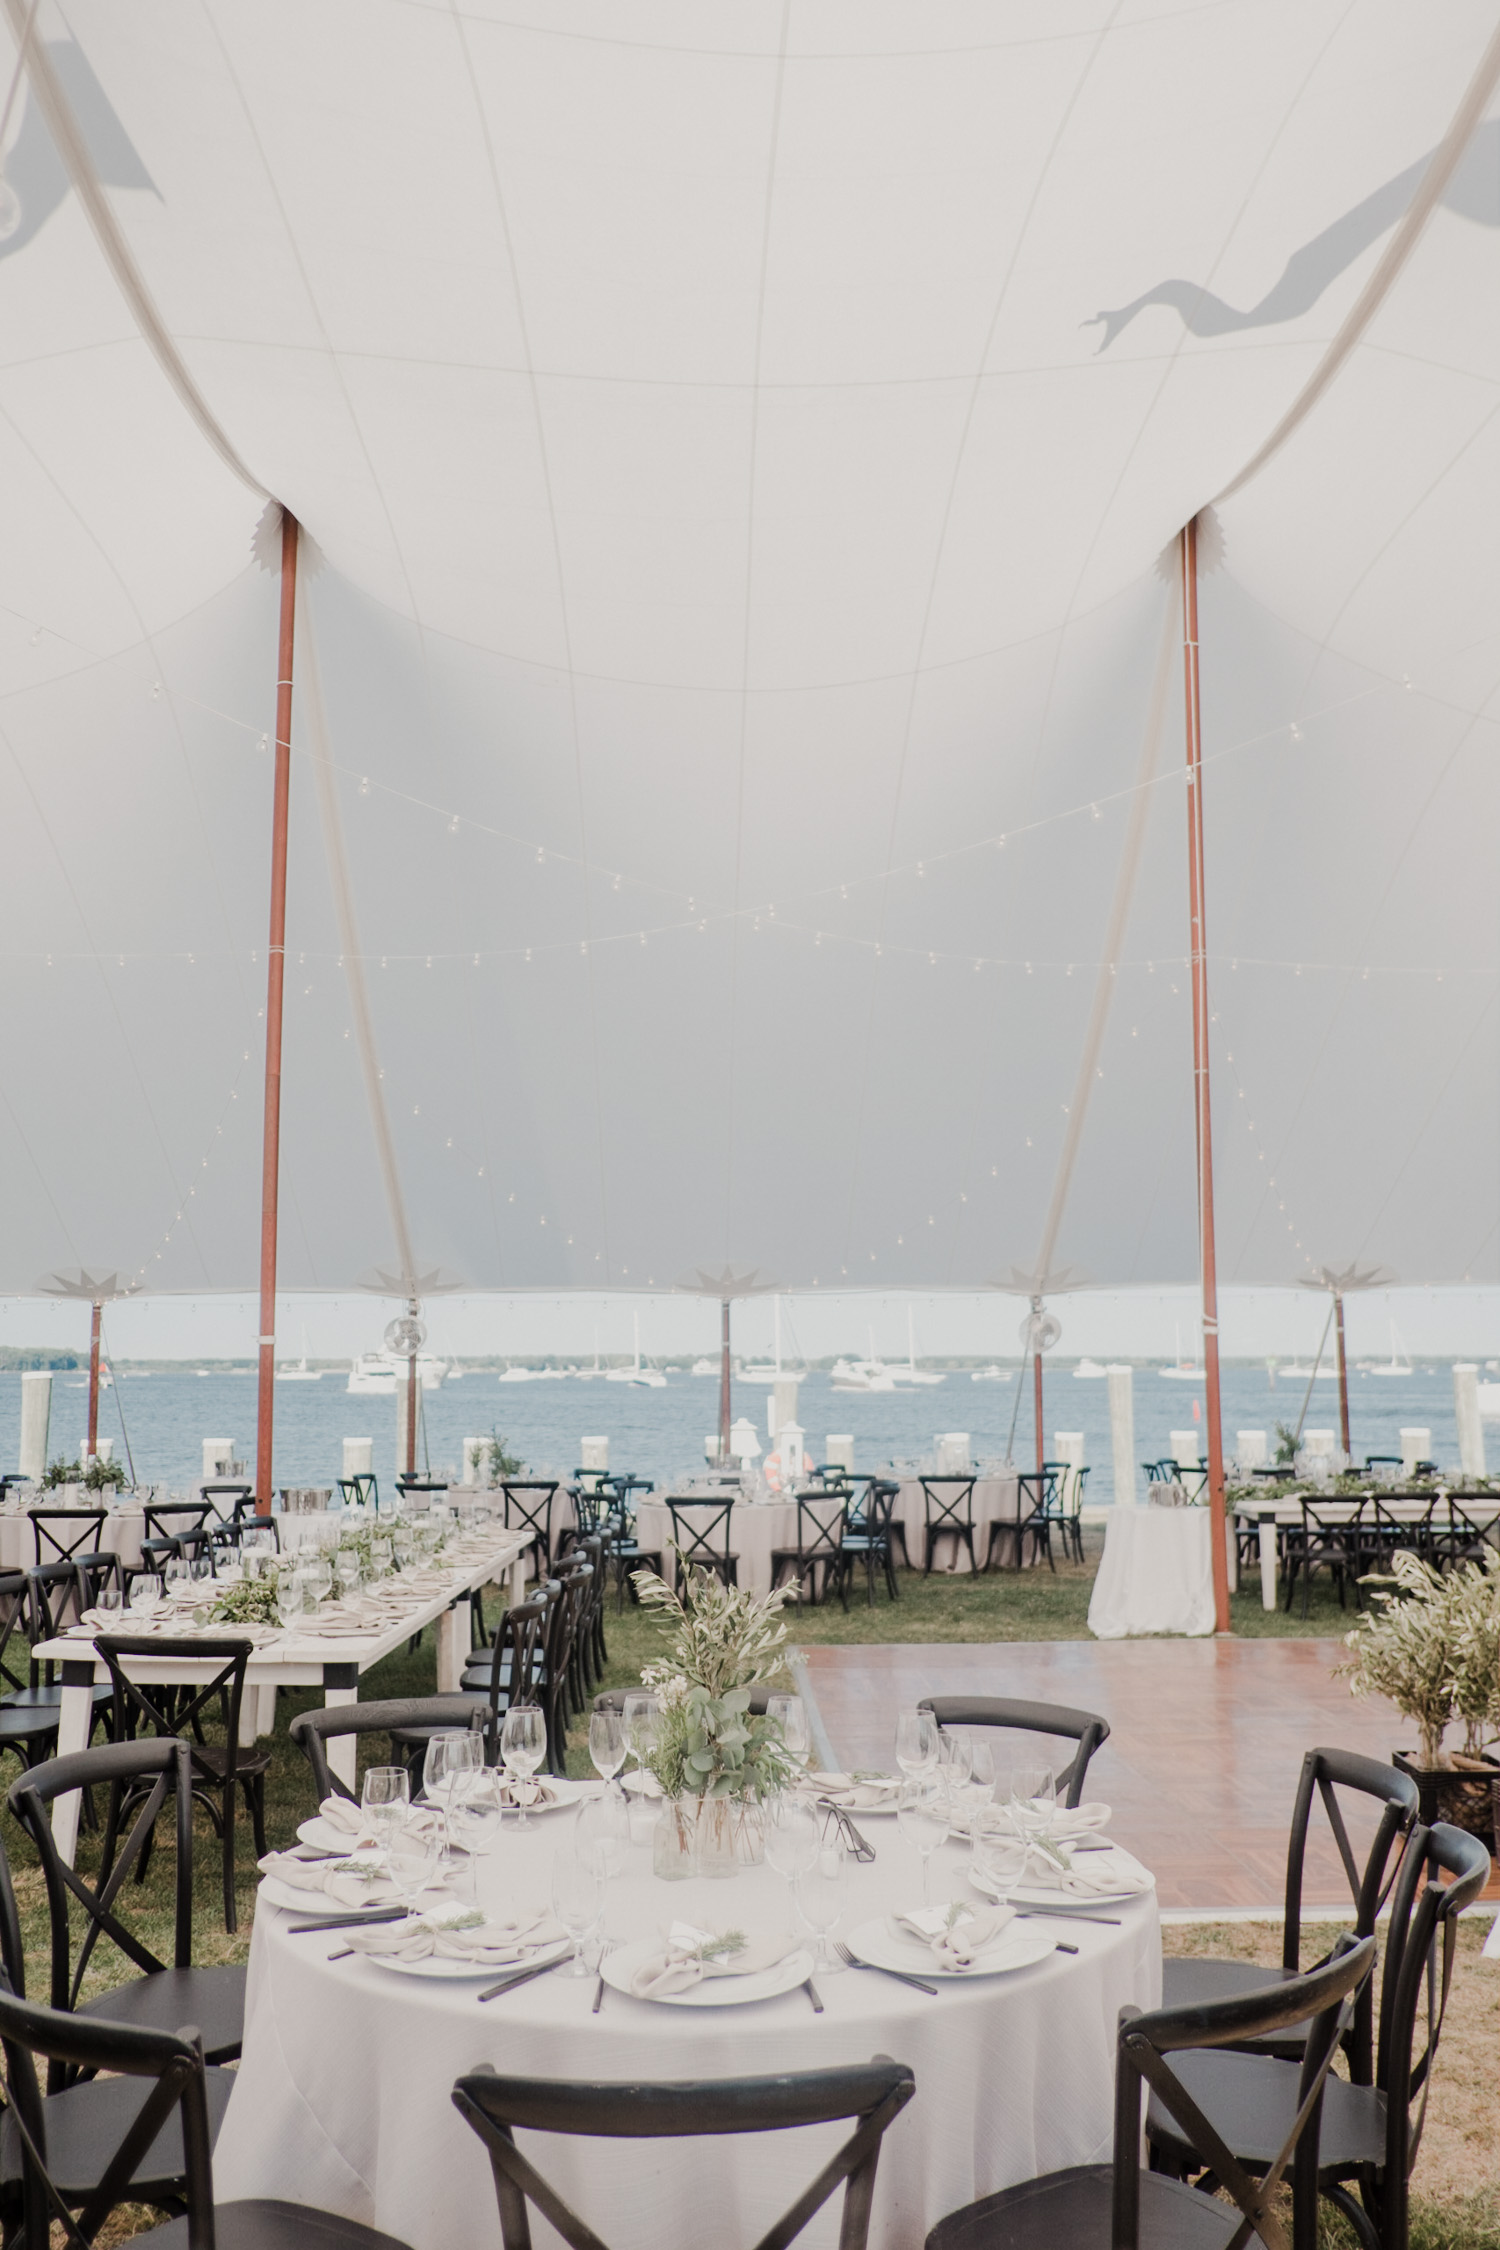 st michaels wedding tent reception details of tables